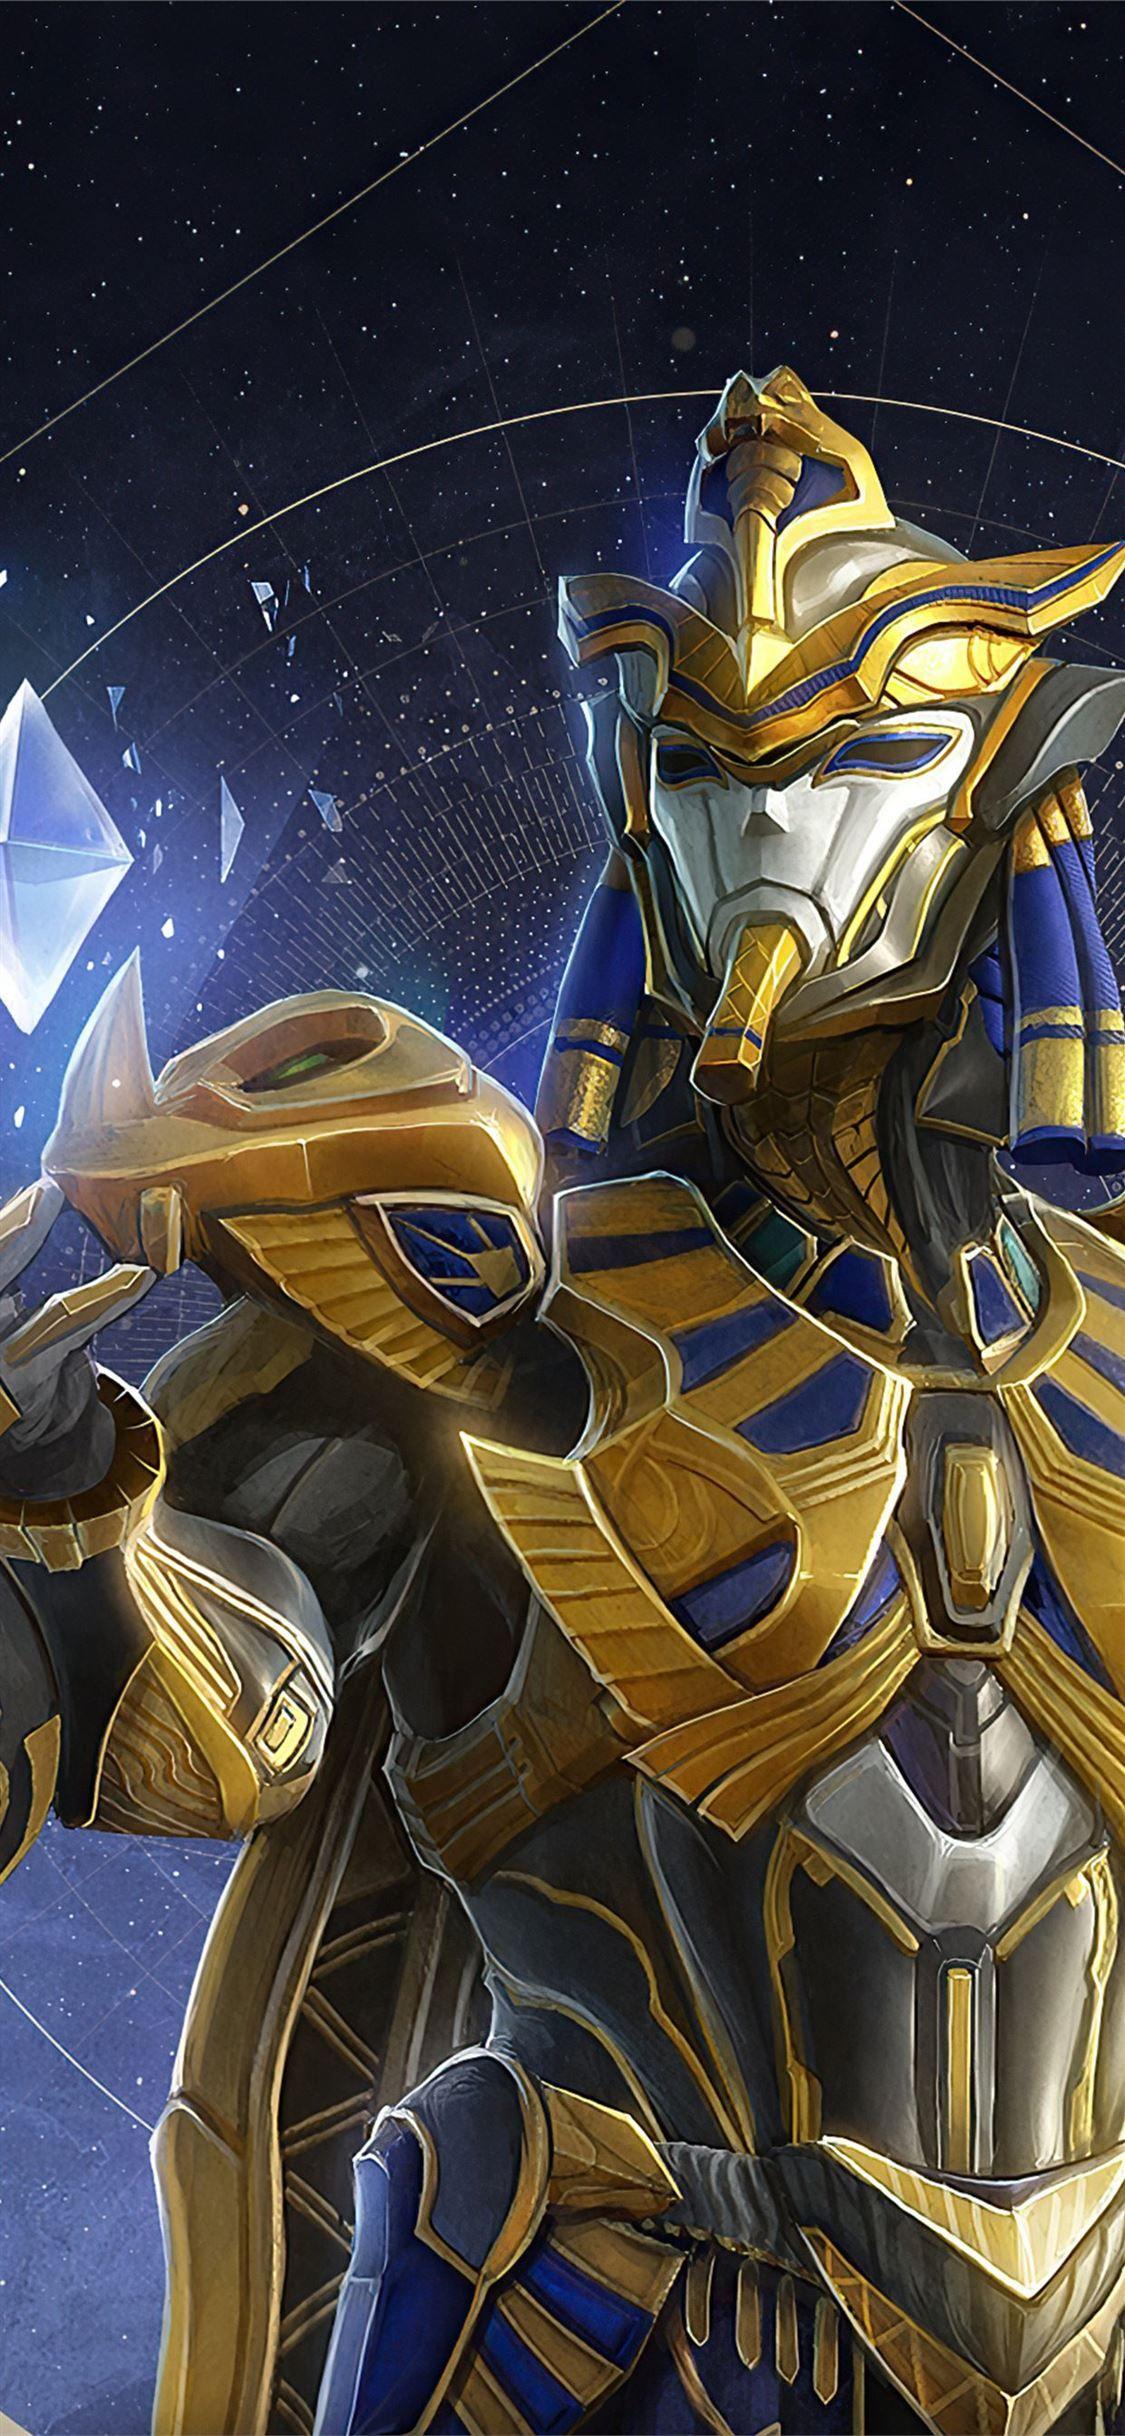 Pubg Golden Pharaoh X Suit 4k Pubg Playerunknownsbattlegrounds Games 4k Iphon In 2020 Superhero Wallpaper Iphone Apple Logo Wallpaper Iphone Game Wallpaper Iphone